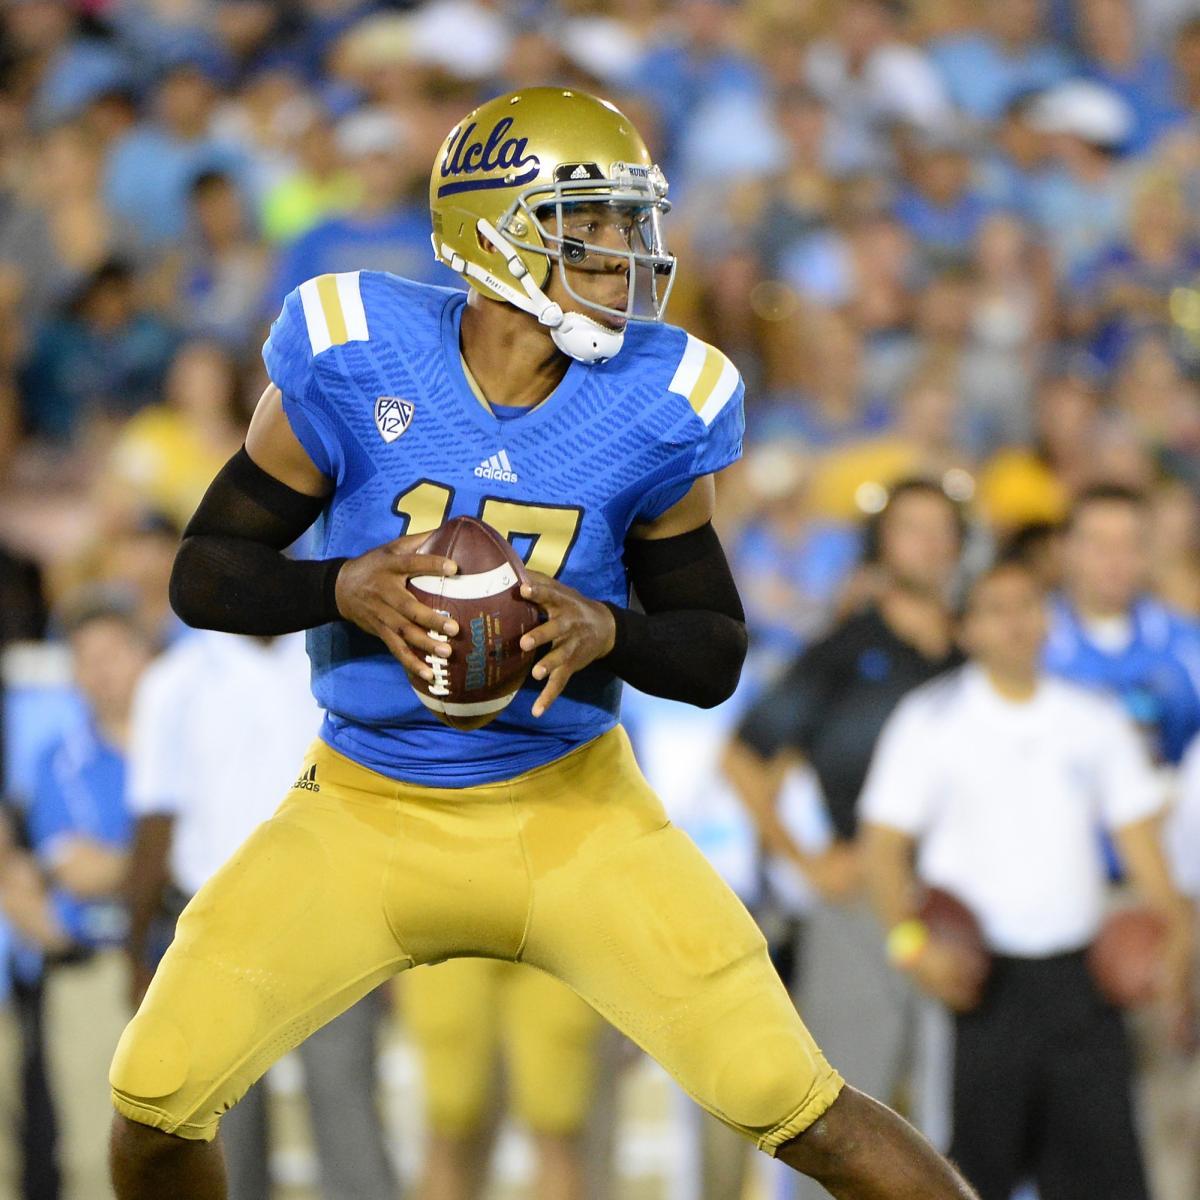 UCLA Football: Does Bye Week Help Or Hurt Bruins' Chances